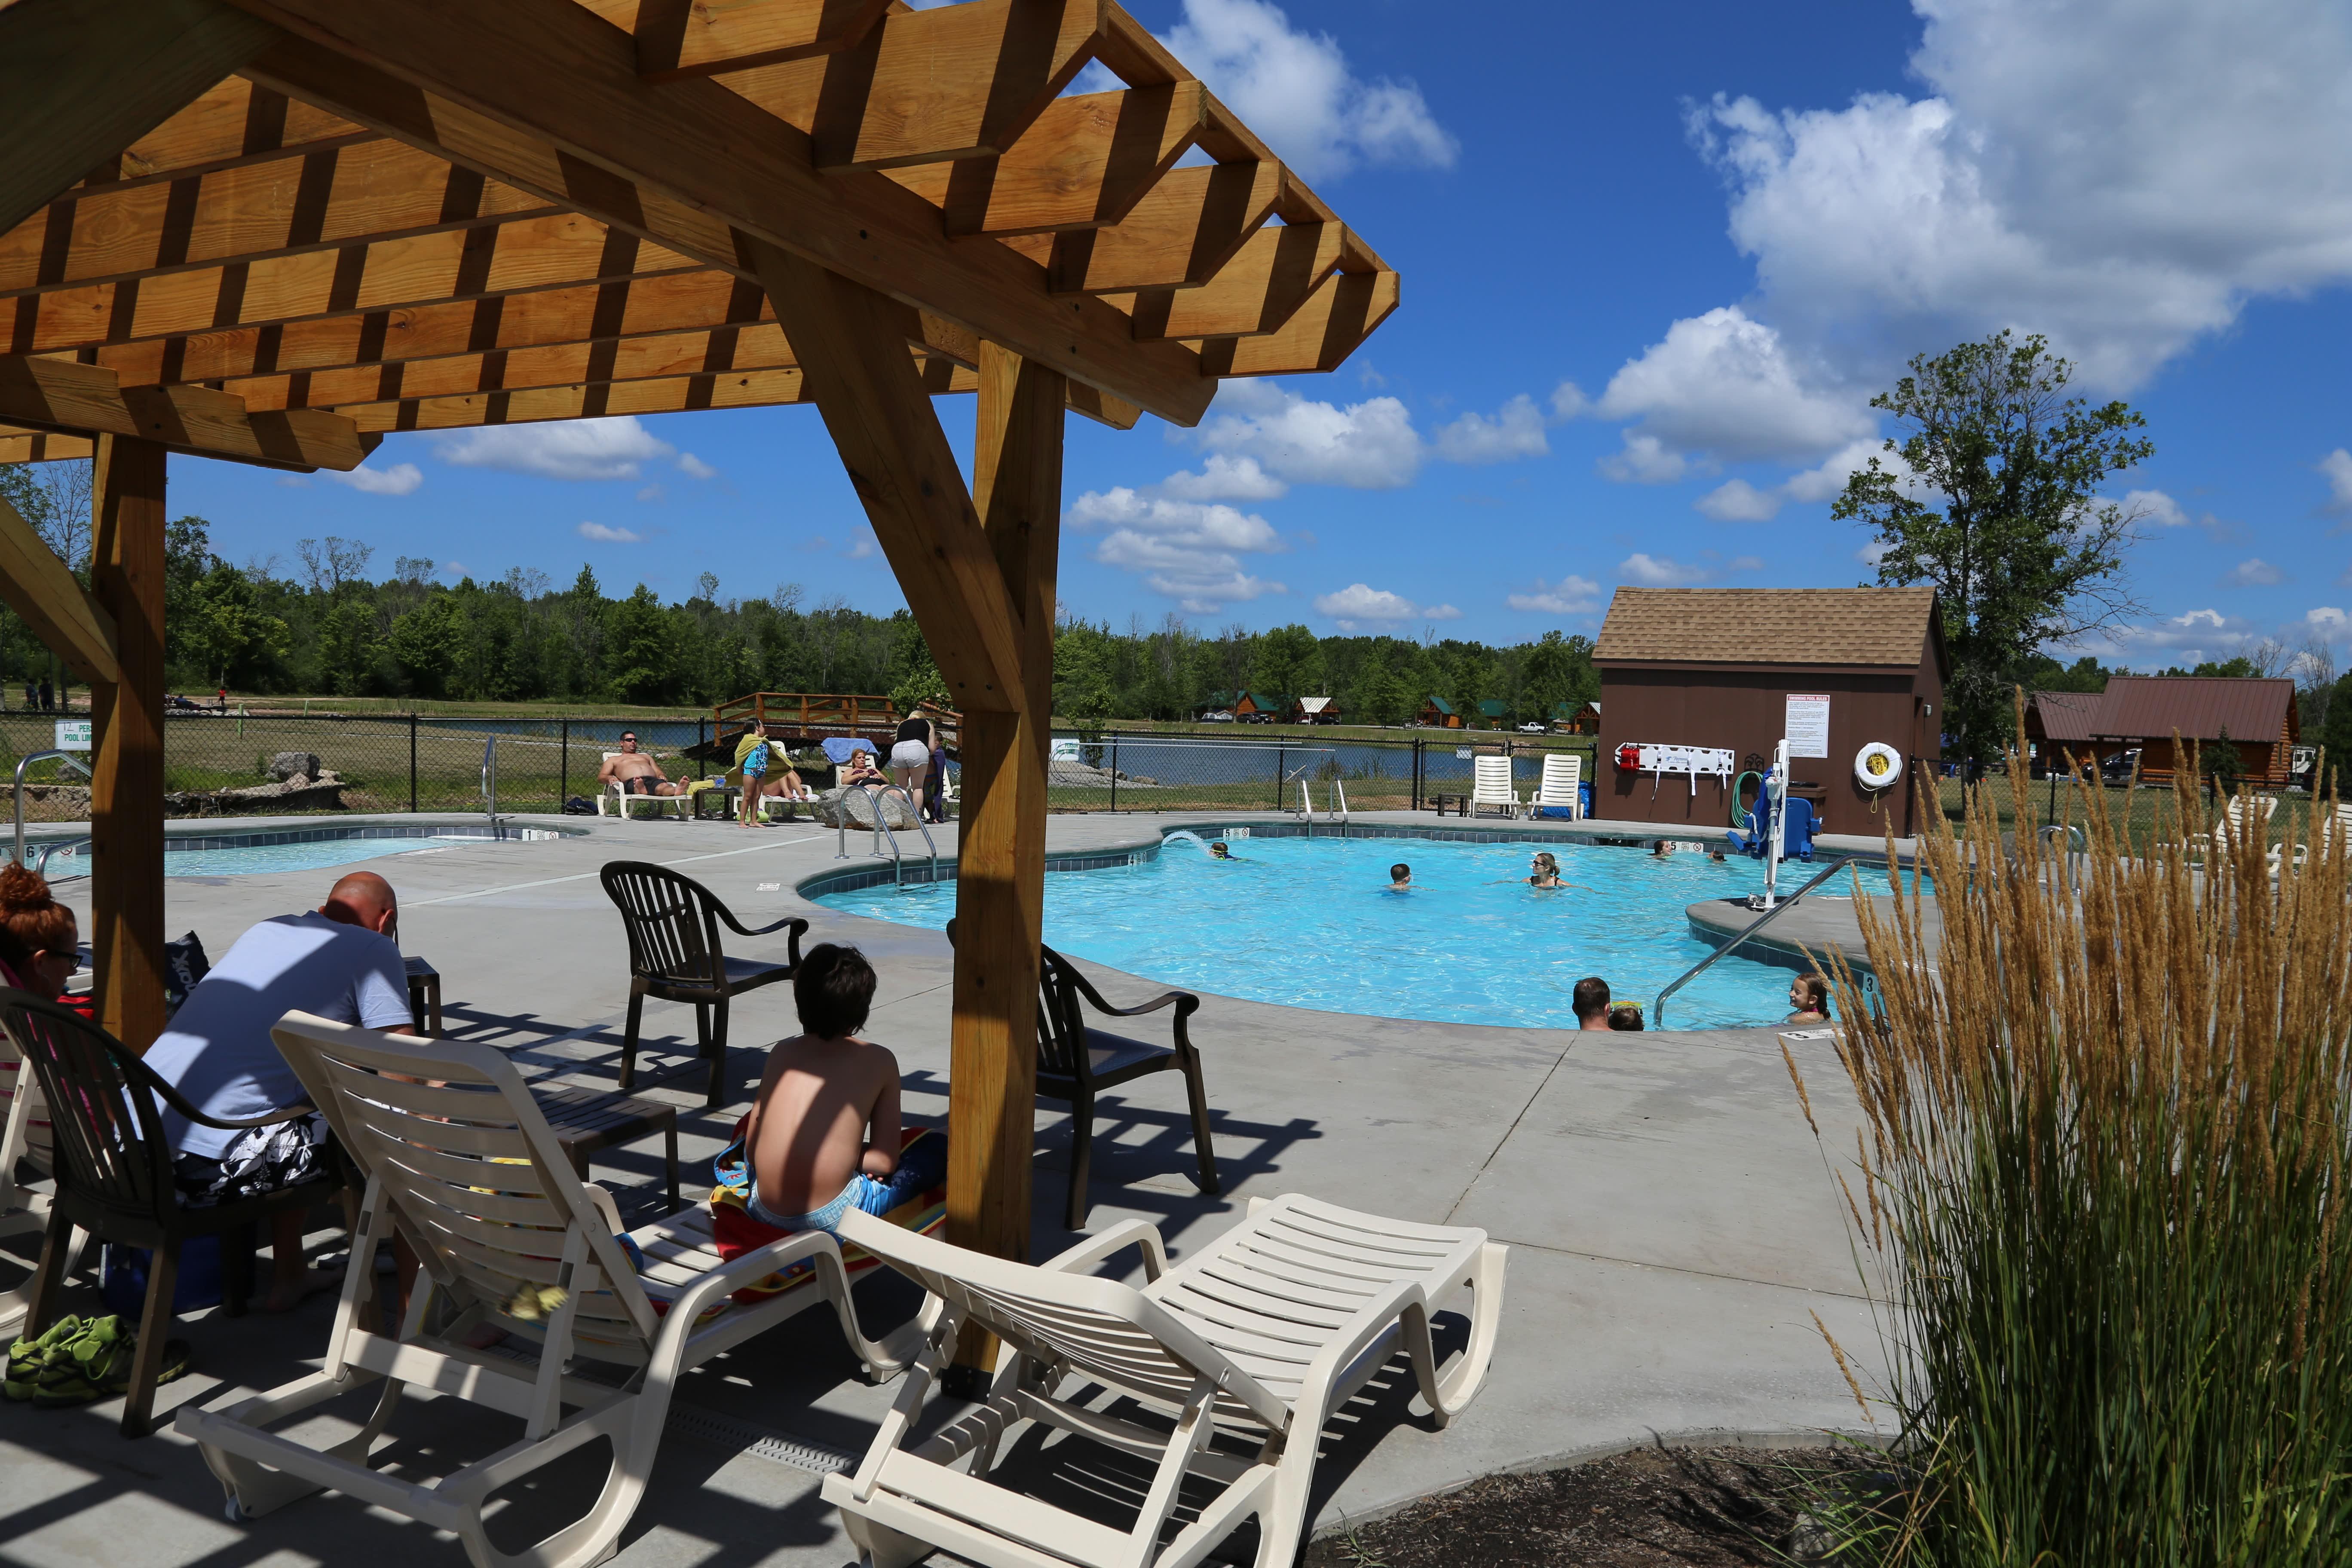 swimming pool with shade pergola